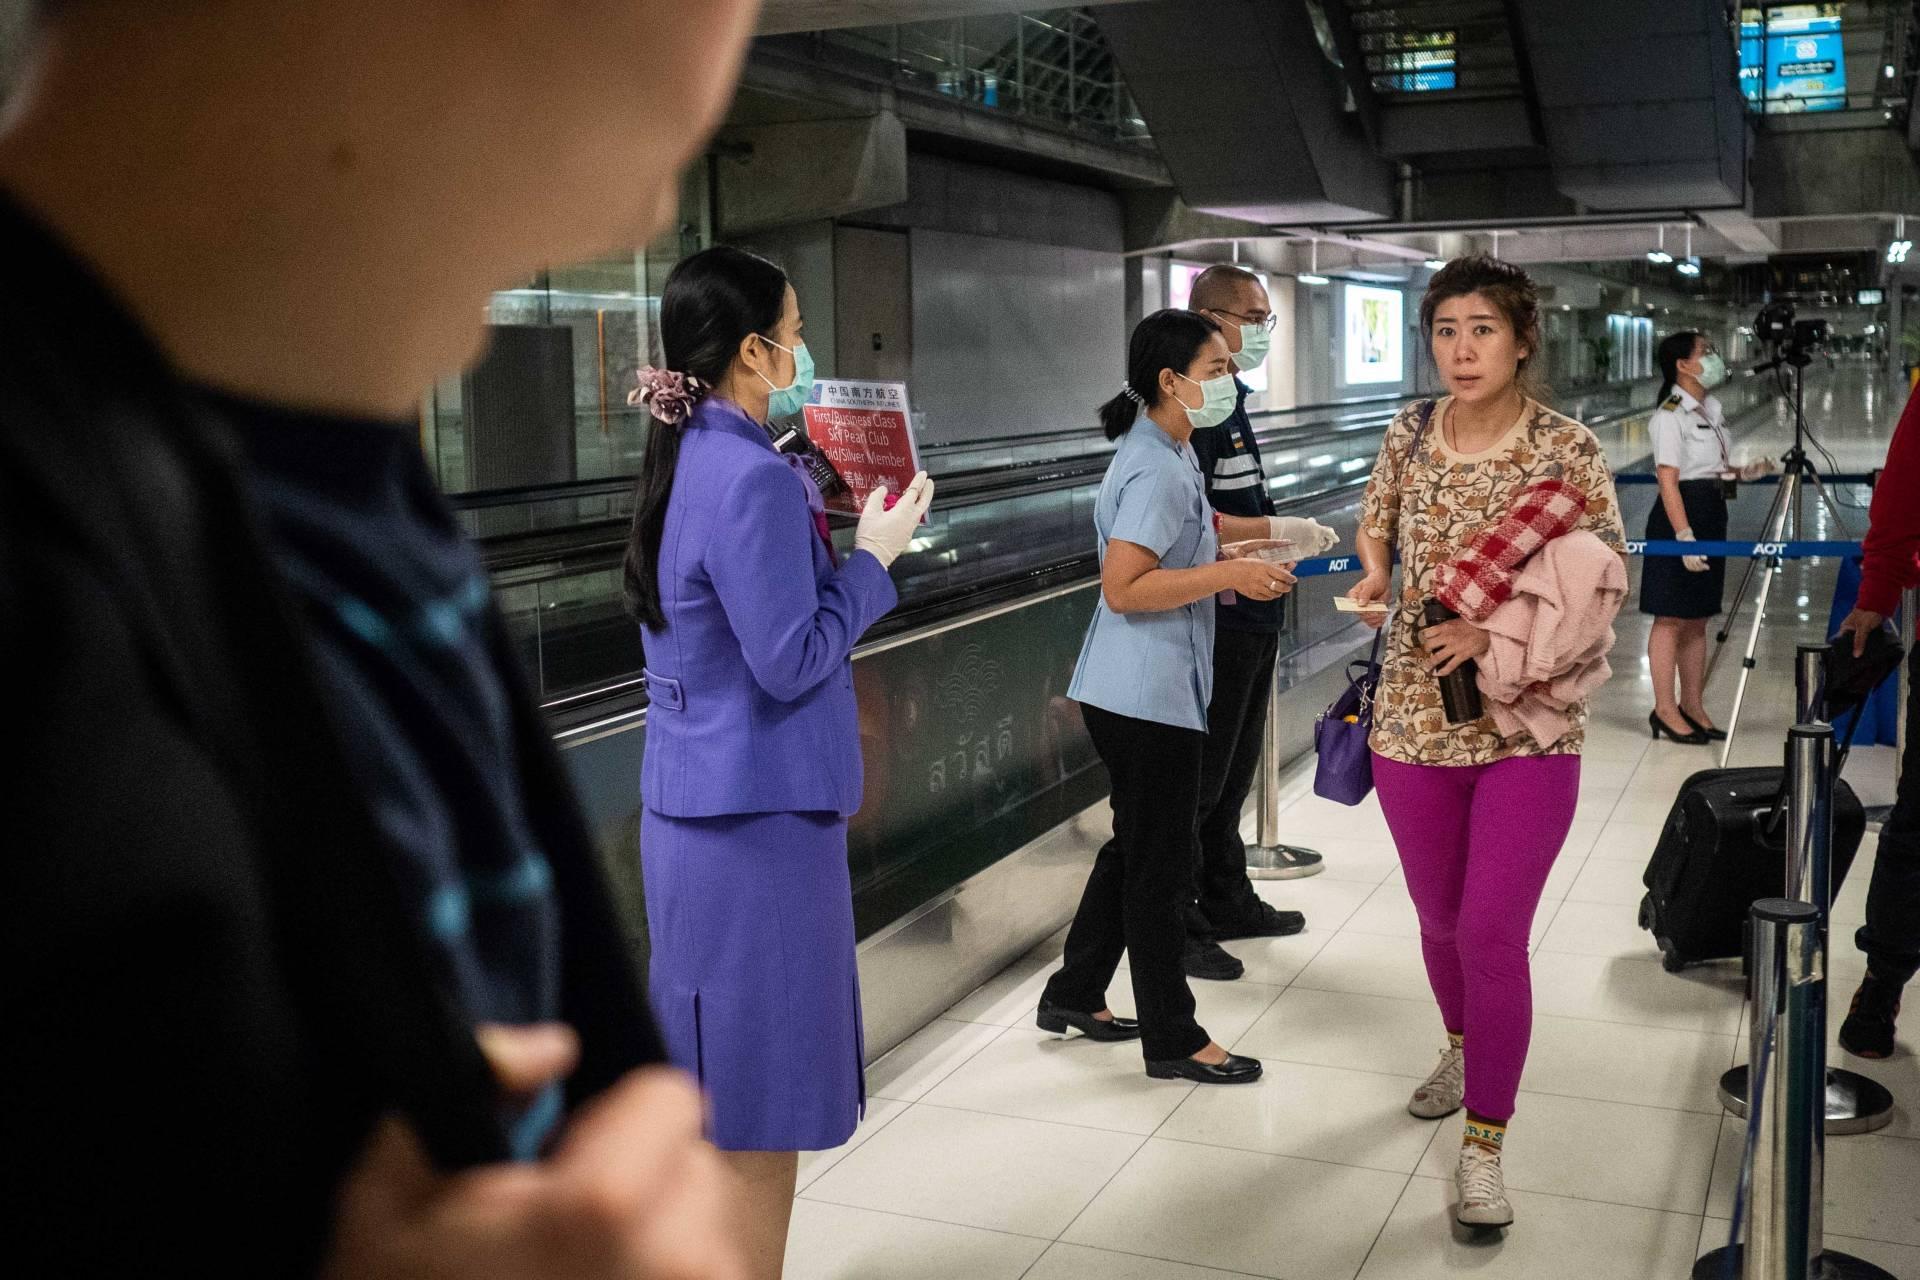 SFO and LAX to Screen Airline Passengers For New Strain of Coronavirus